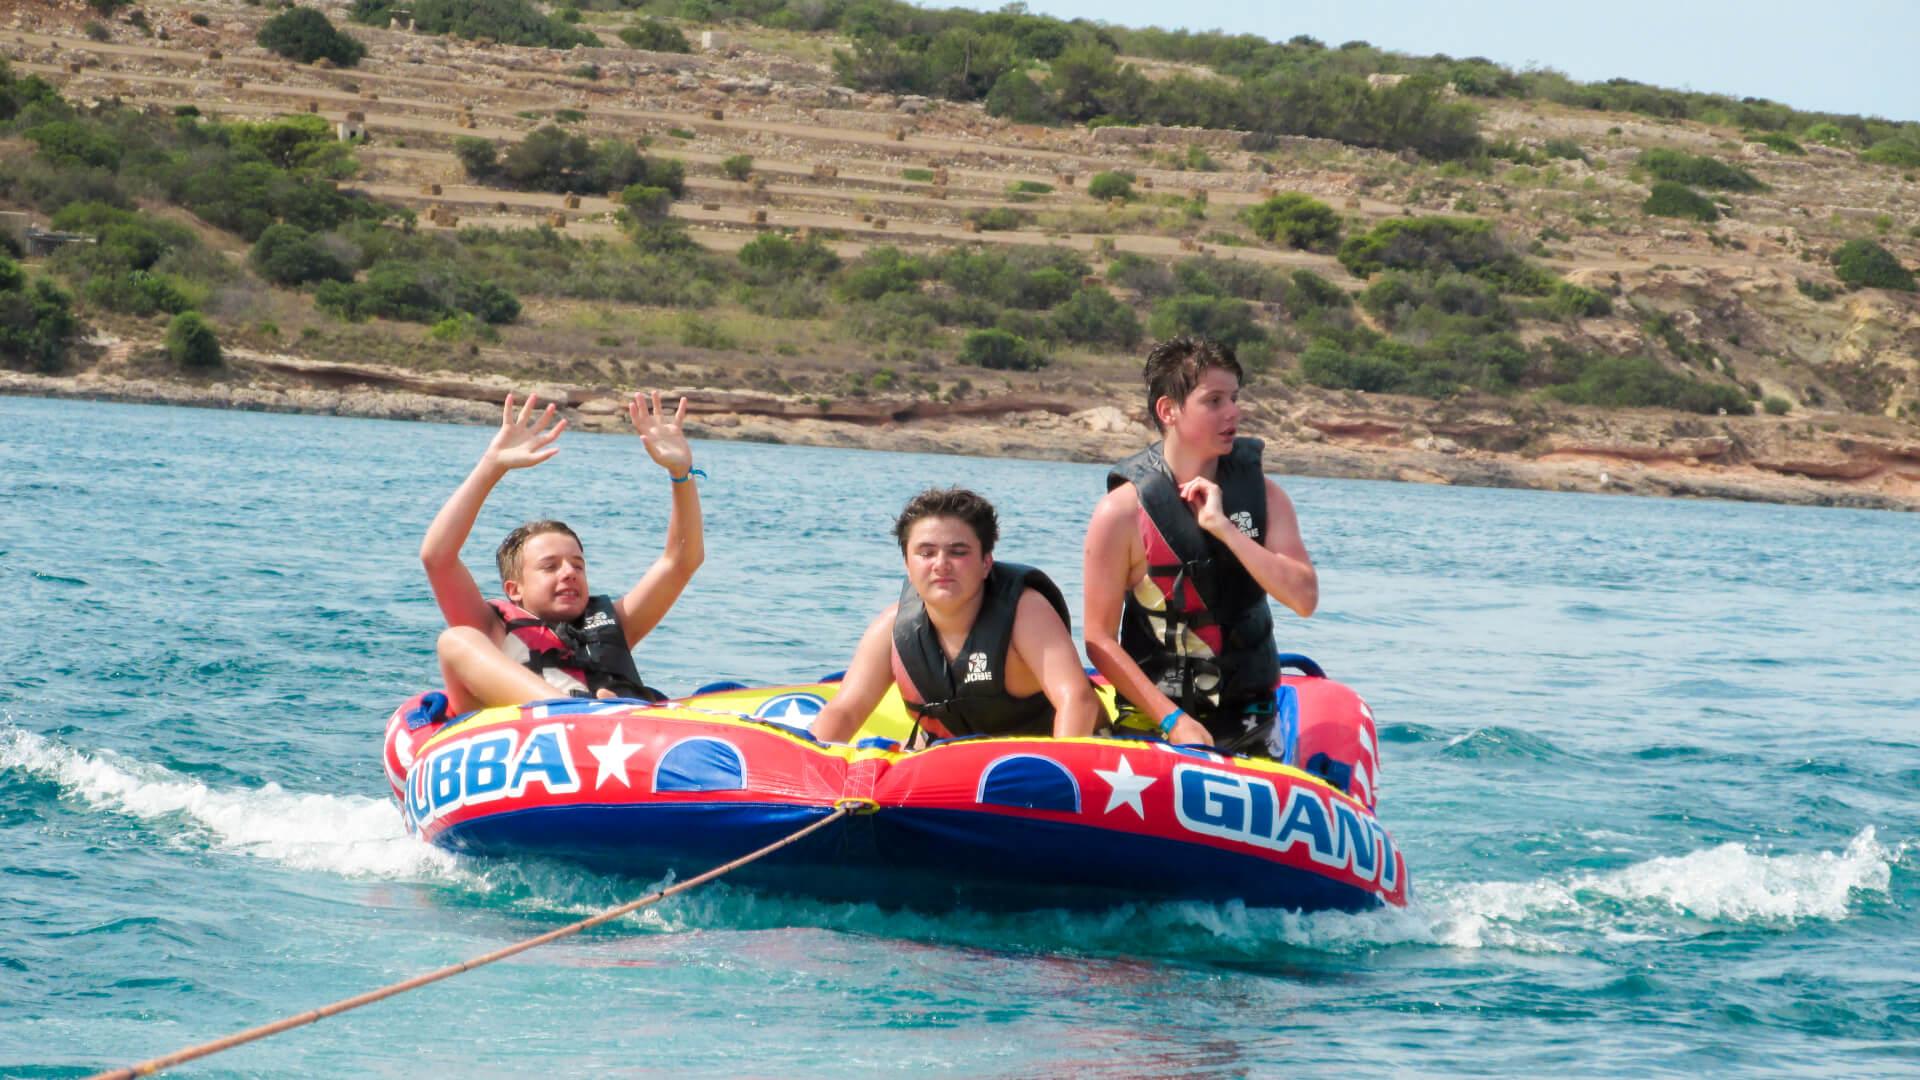 Malta watersports